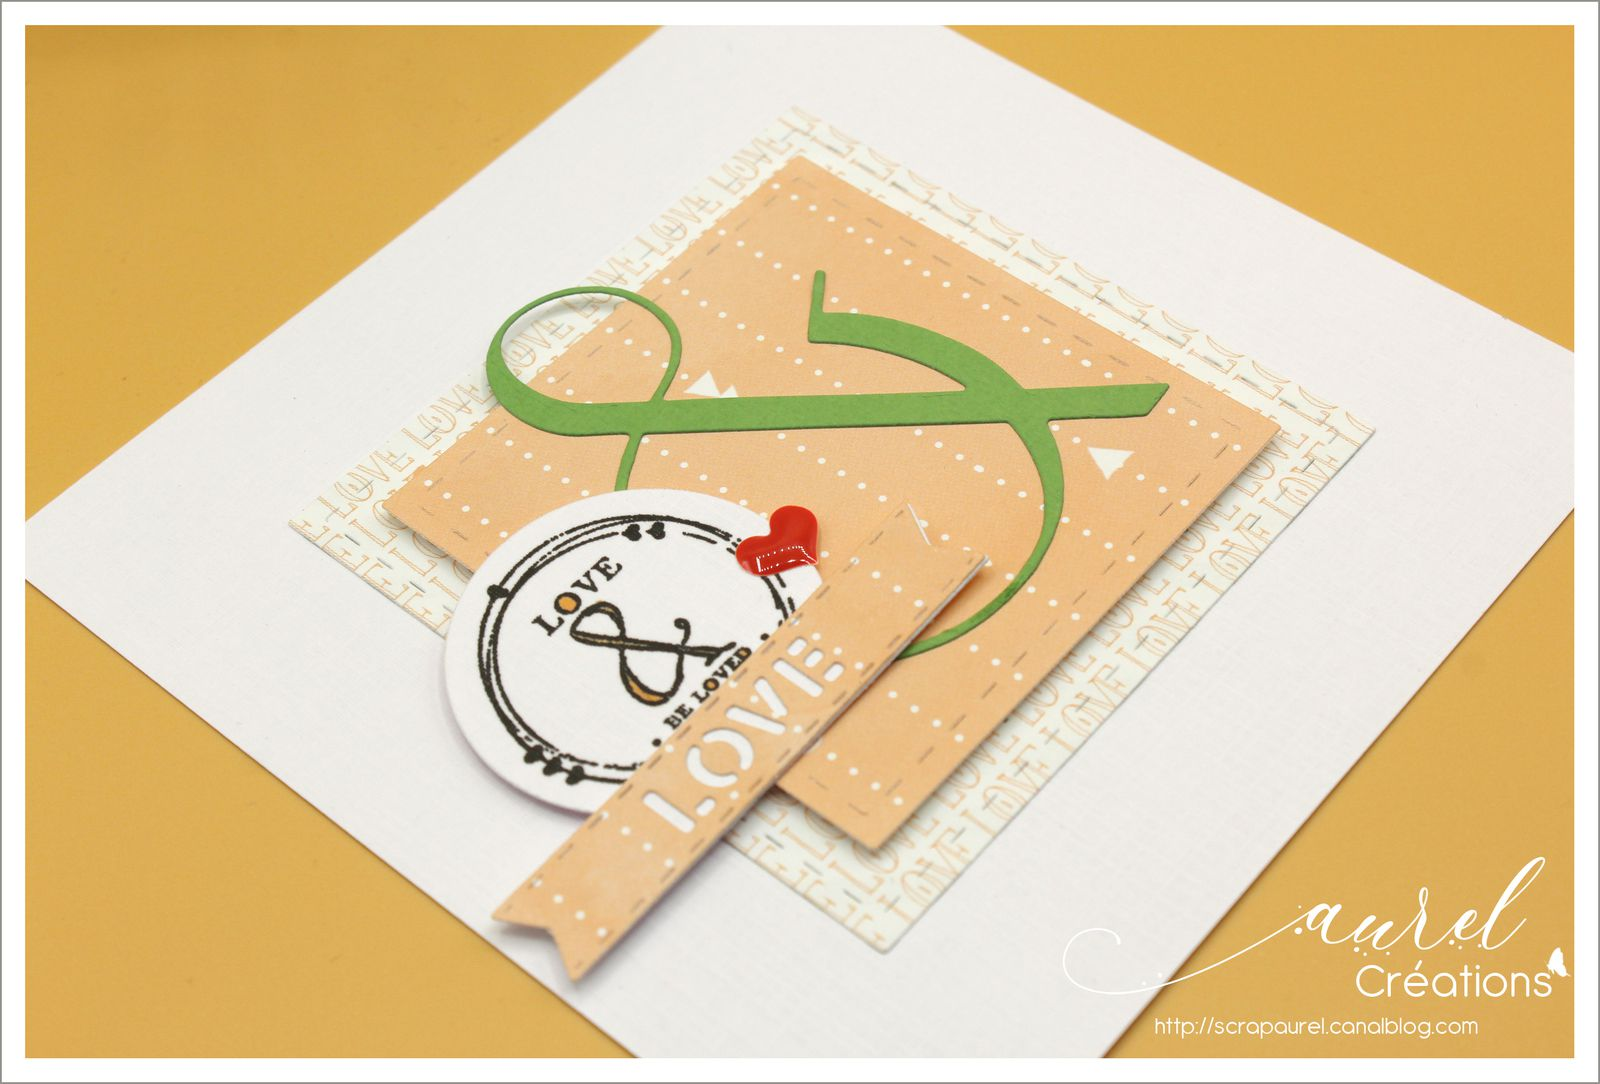 Aurel - 3 petites cartes